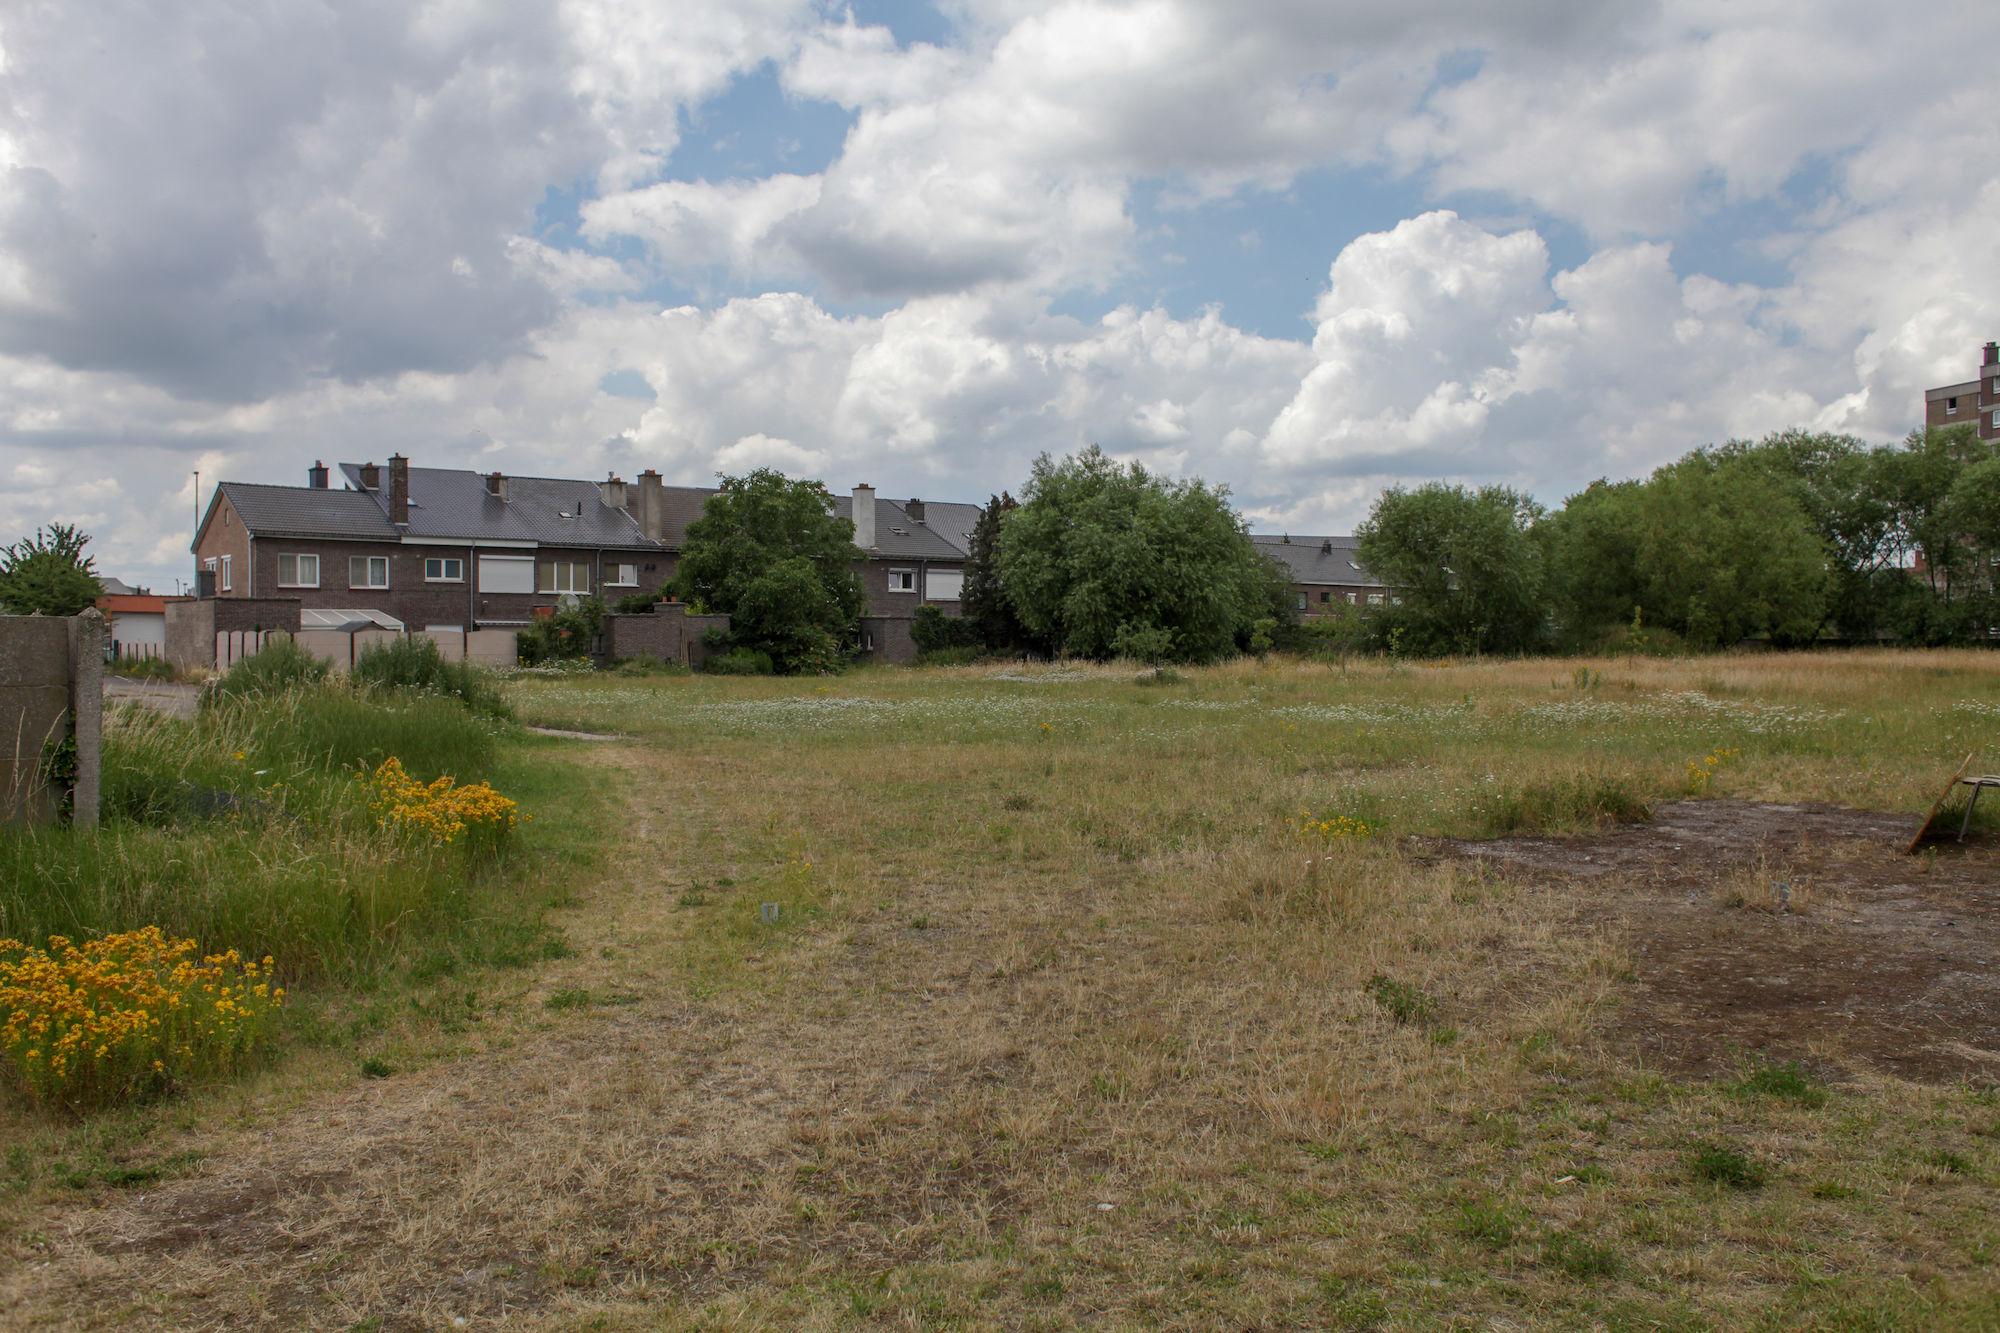 2019-07-02 Muide Meulestede prospectie Wannes_stadsvernieuwing_IMG_0337-2.jpg